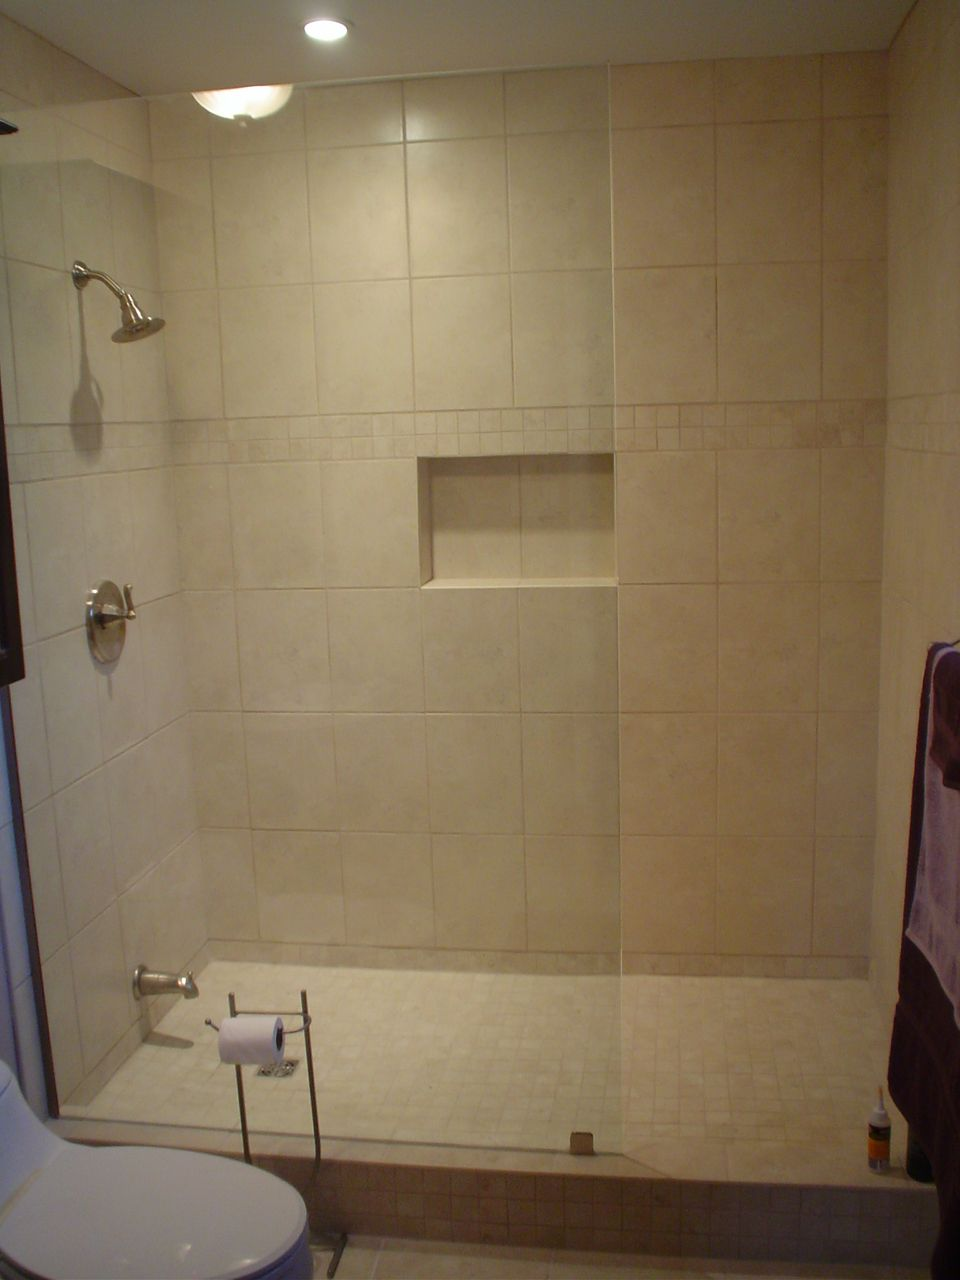 We built this custom shower with a concrete wall to wall shower we built this custom shower with a concrete wall to wall shower base and recessed soap sliding glass doorglass doorssoap planetlyrics Gallery